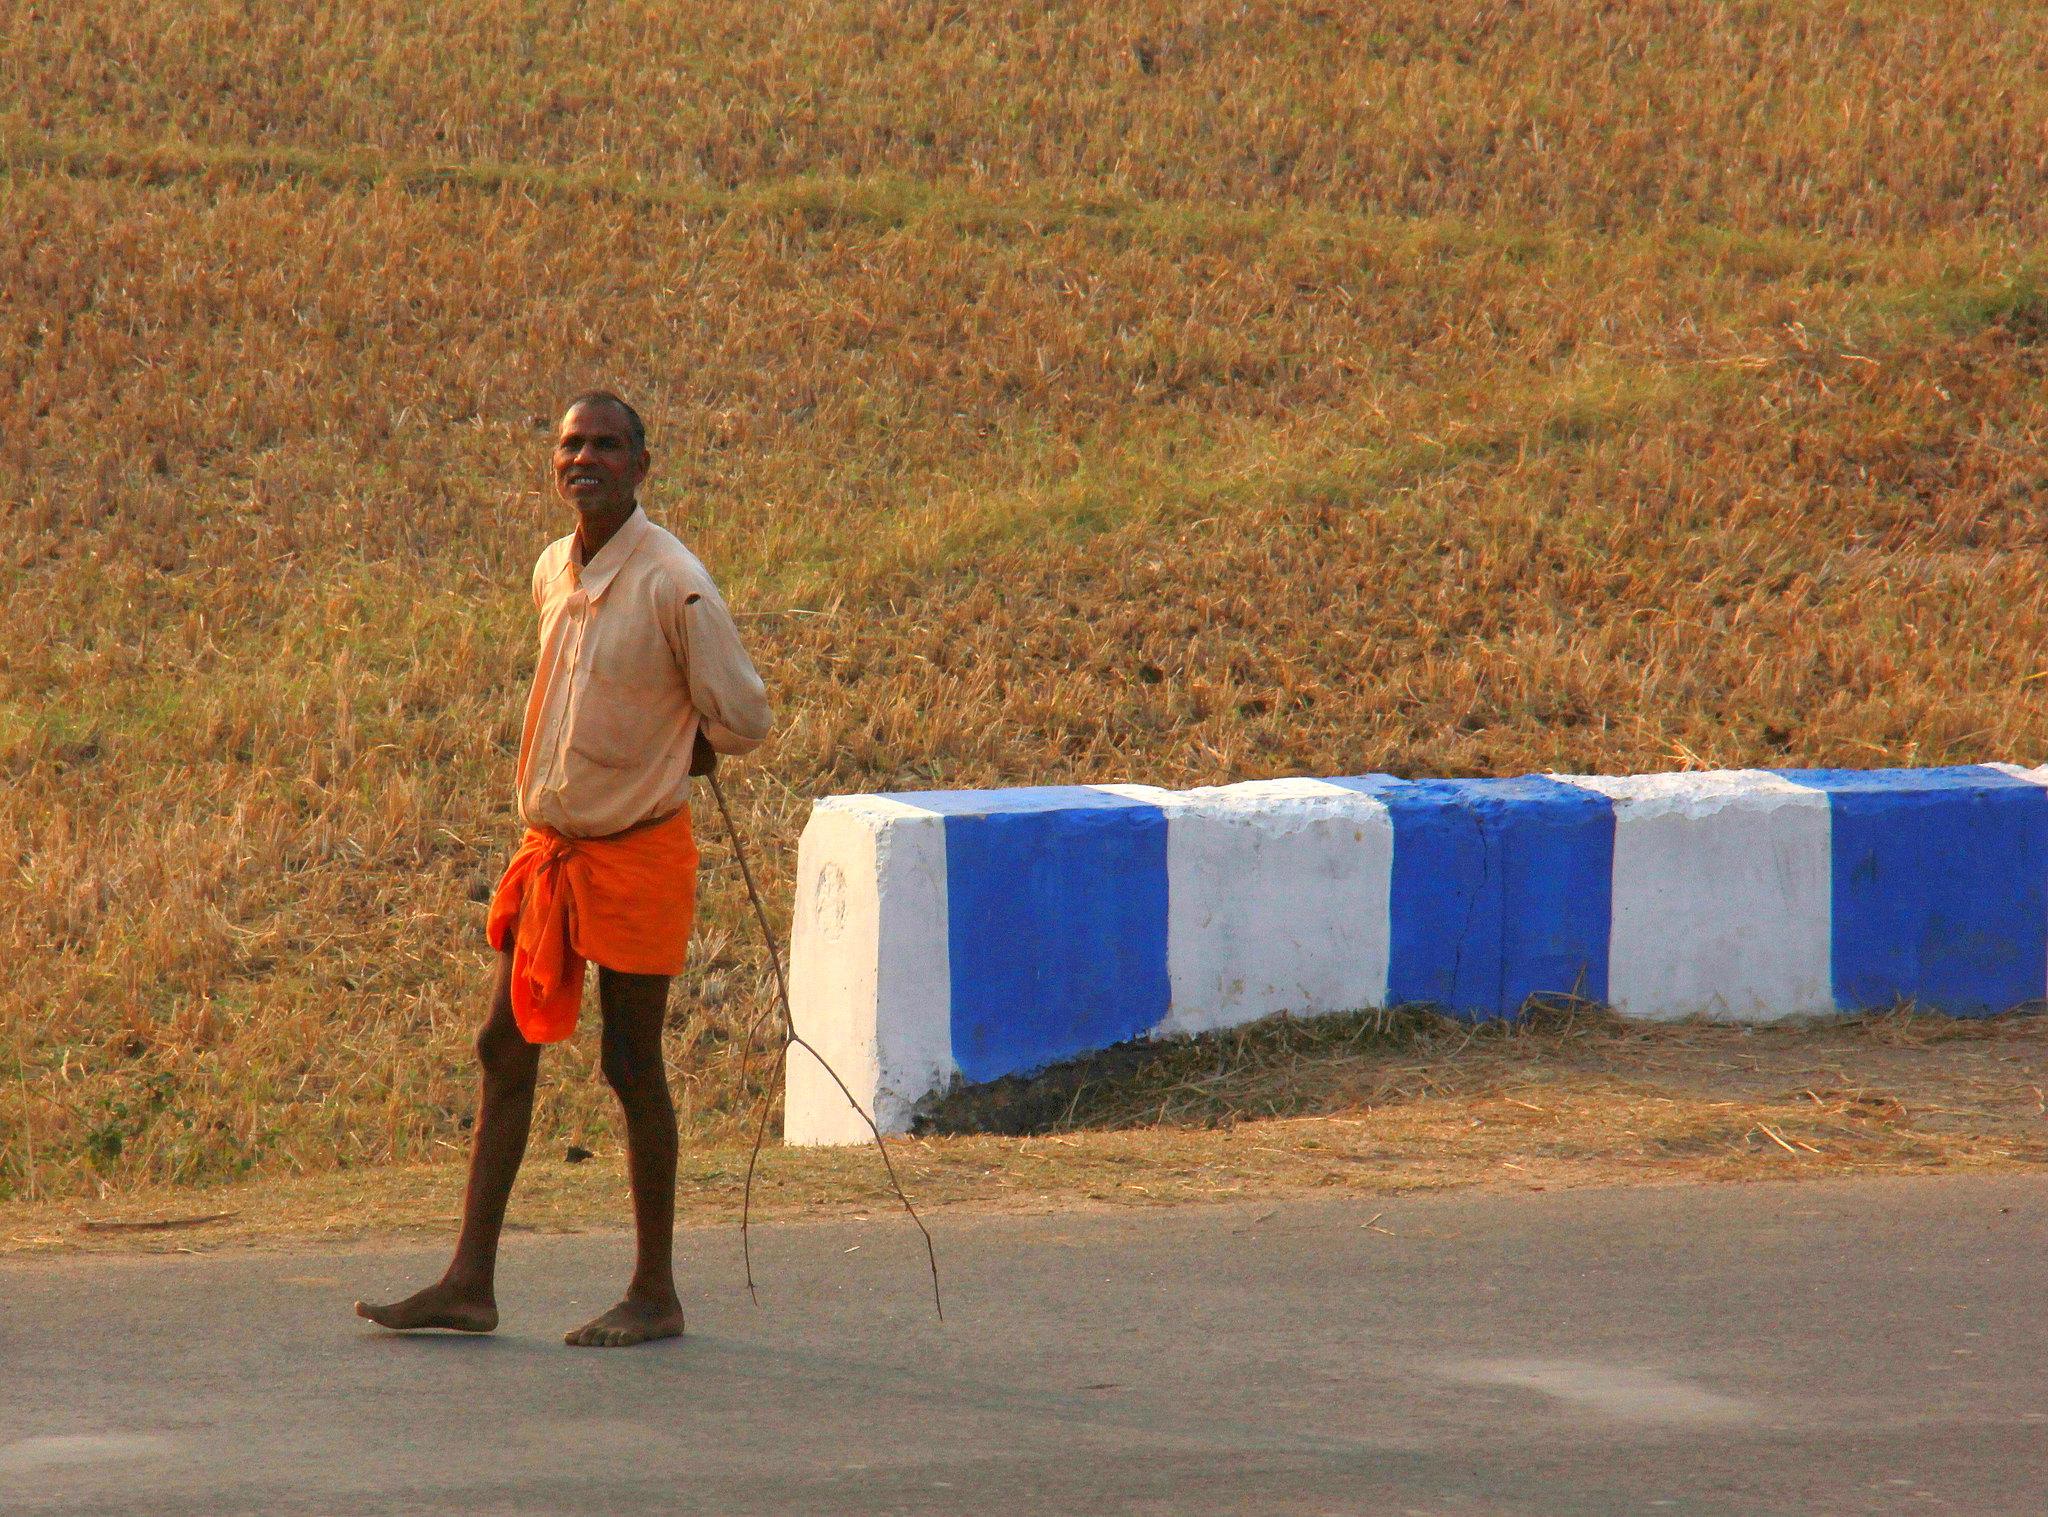 #westbengaltourism #puruliatourism #travelbloggerindia #travelblogindia